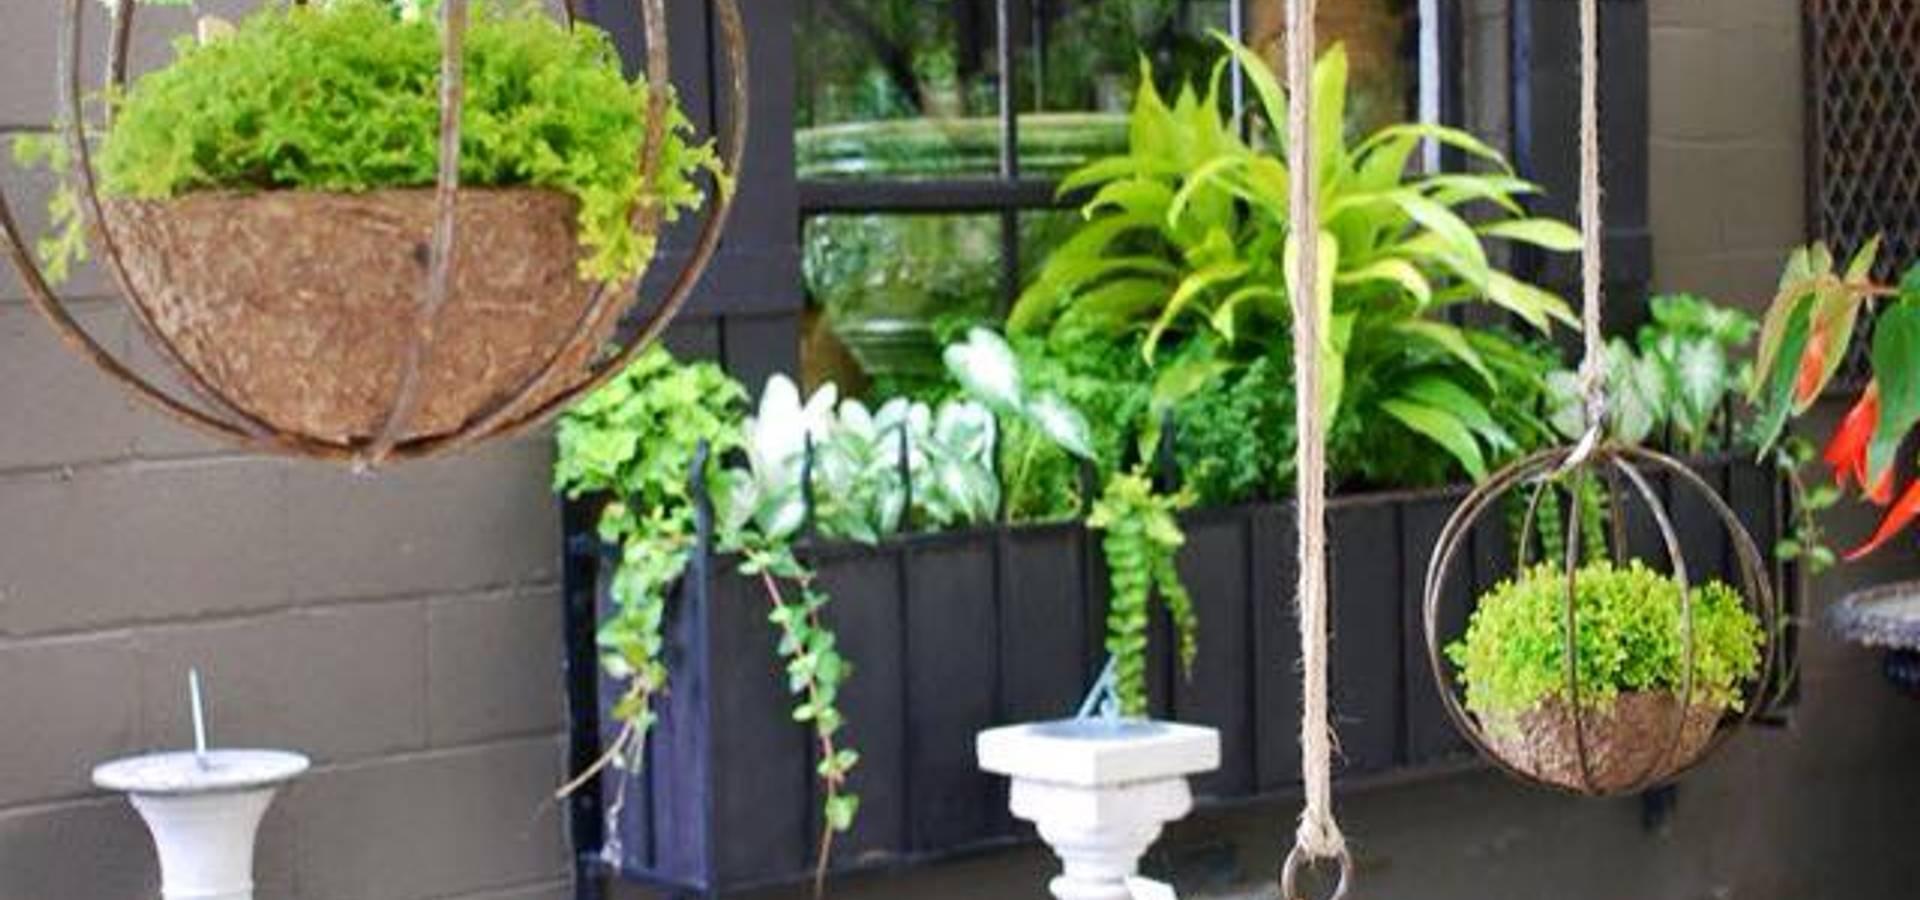 Interior de estudio de jardines verticales homify for Proyecto jardines verticales